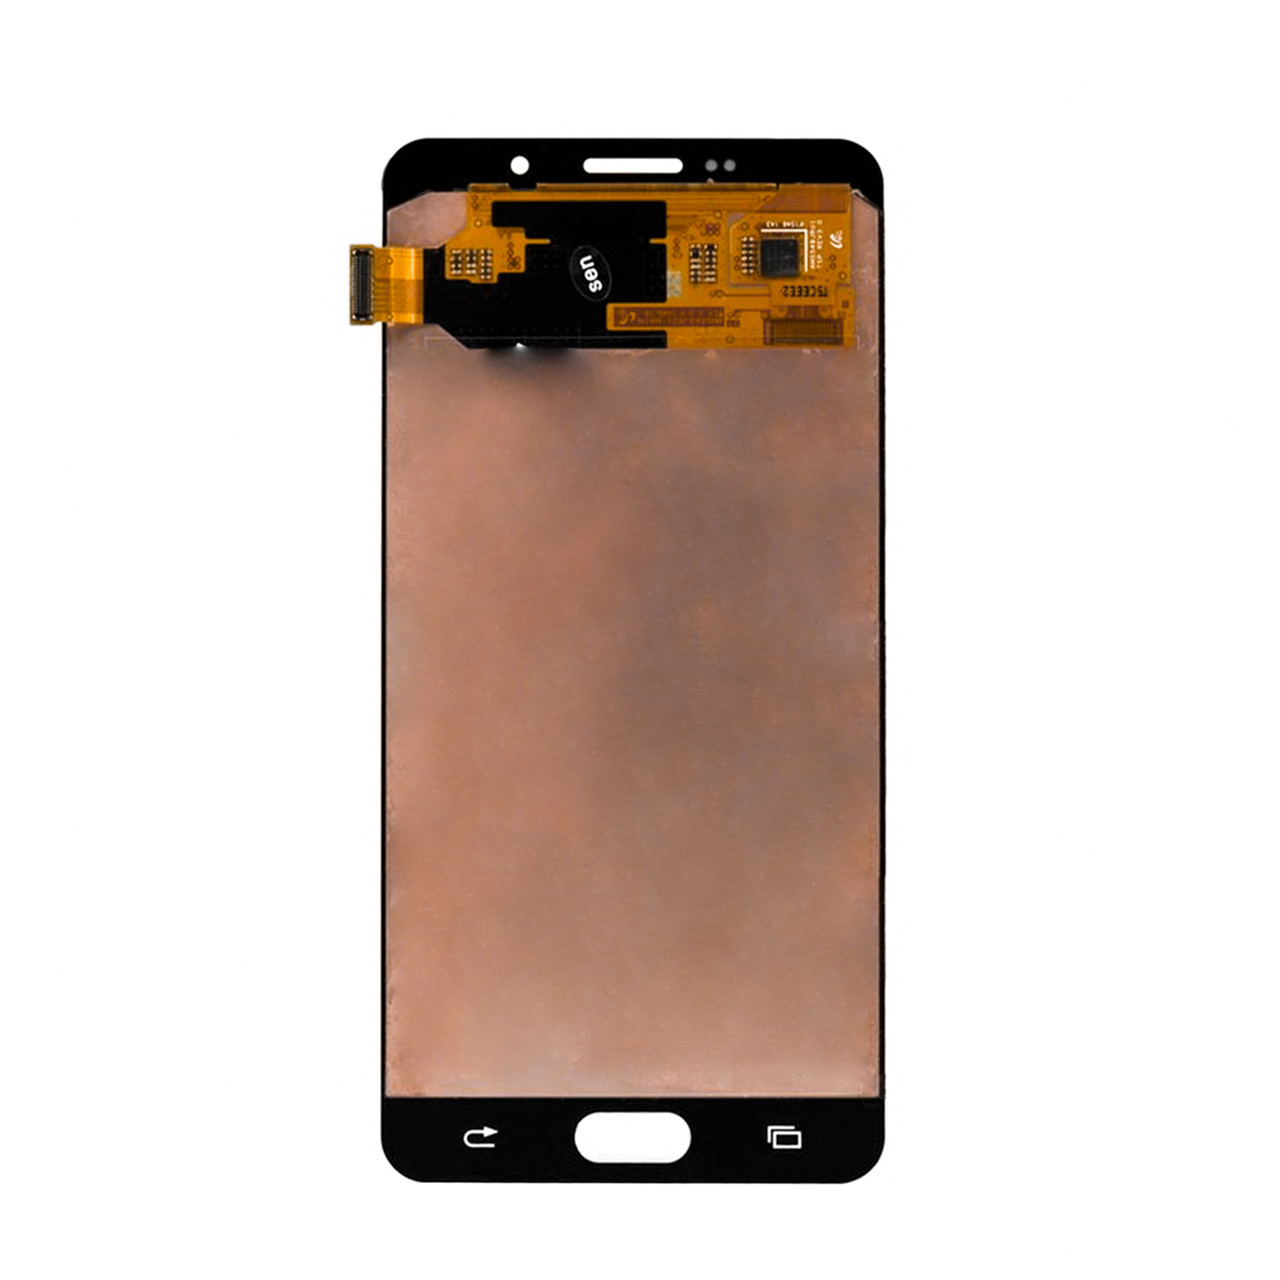 Дисплей Samsung Galaxy A7 (2016) A710 в сборе White (24)